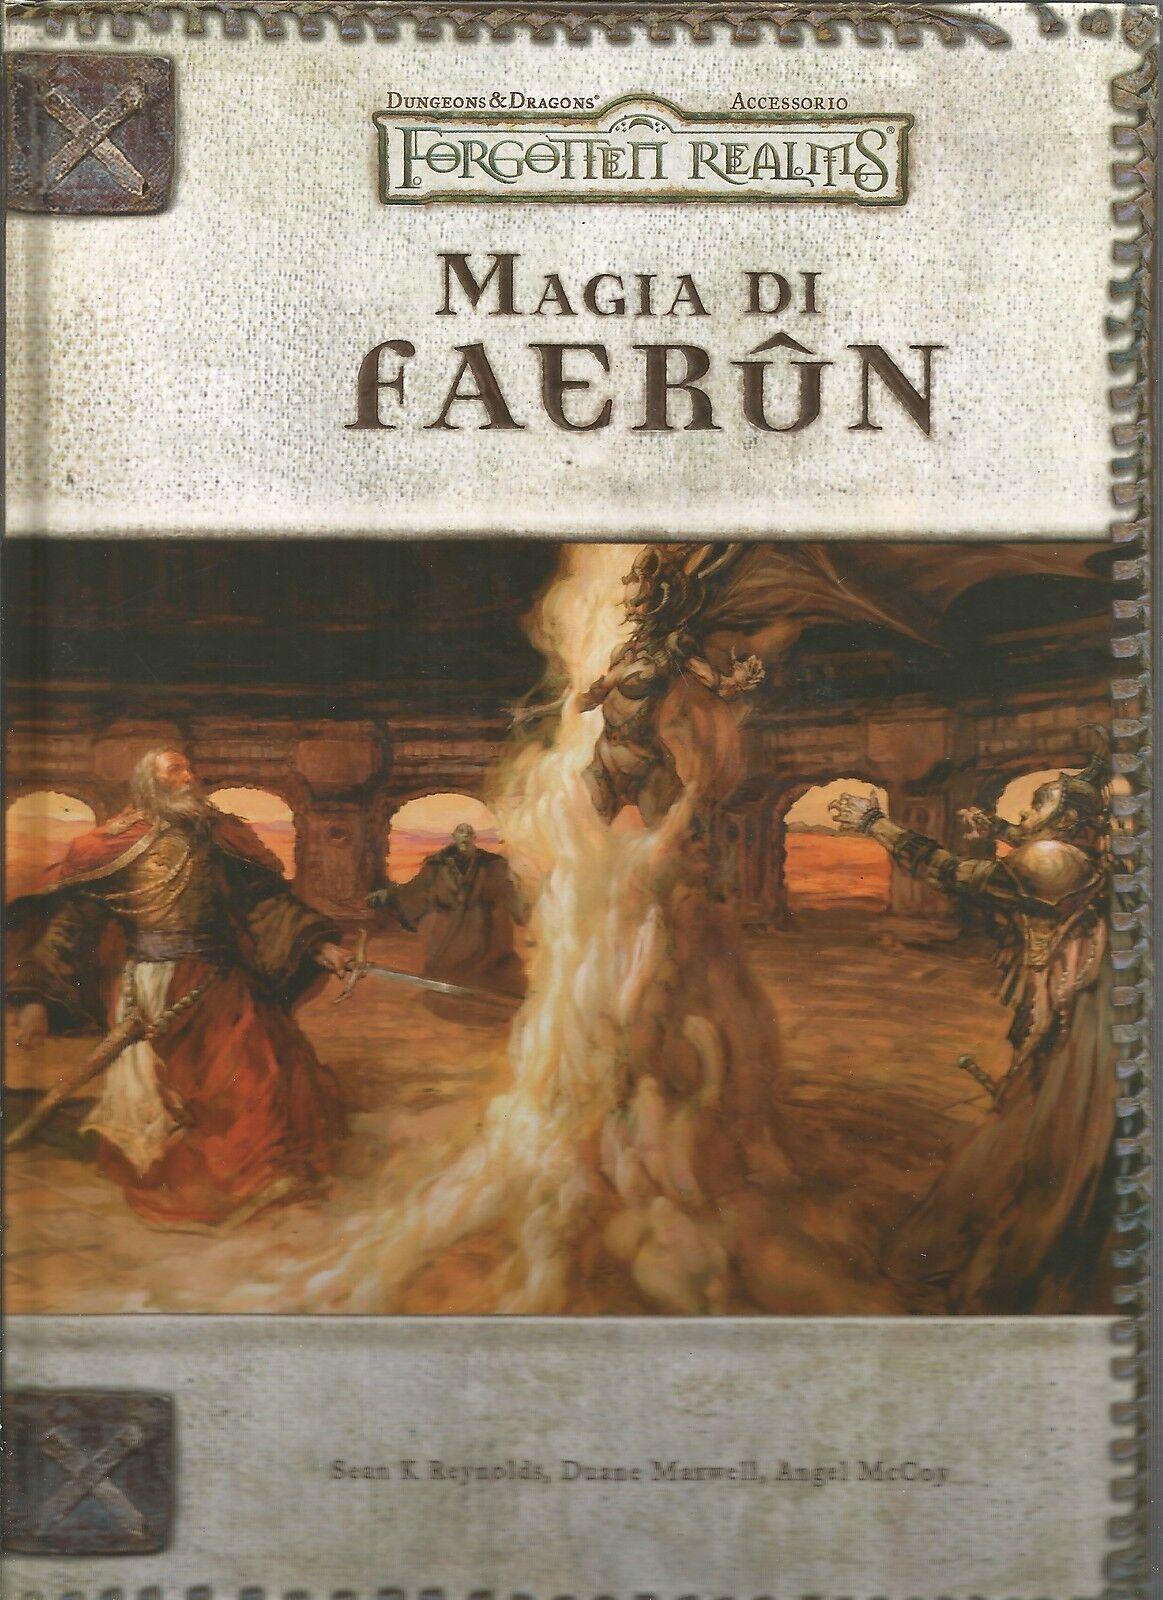 D&D - Dungeons & Dragons - Forgotten Realms - Magia di Faerun - USATO Buono